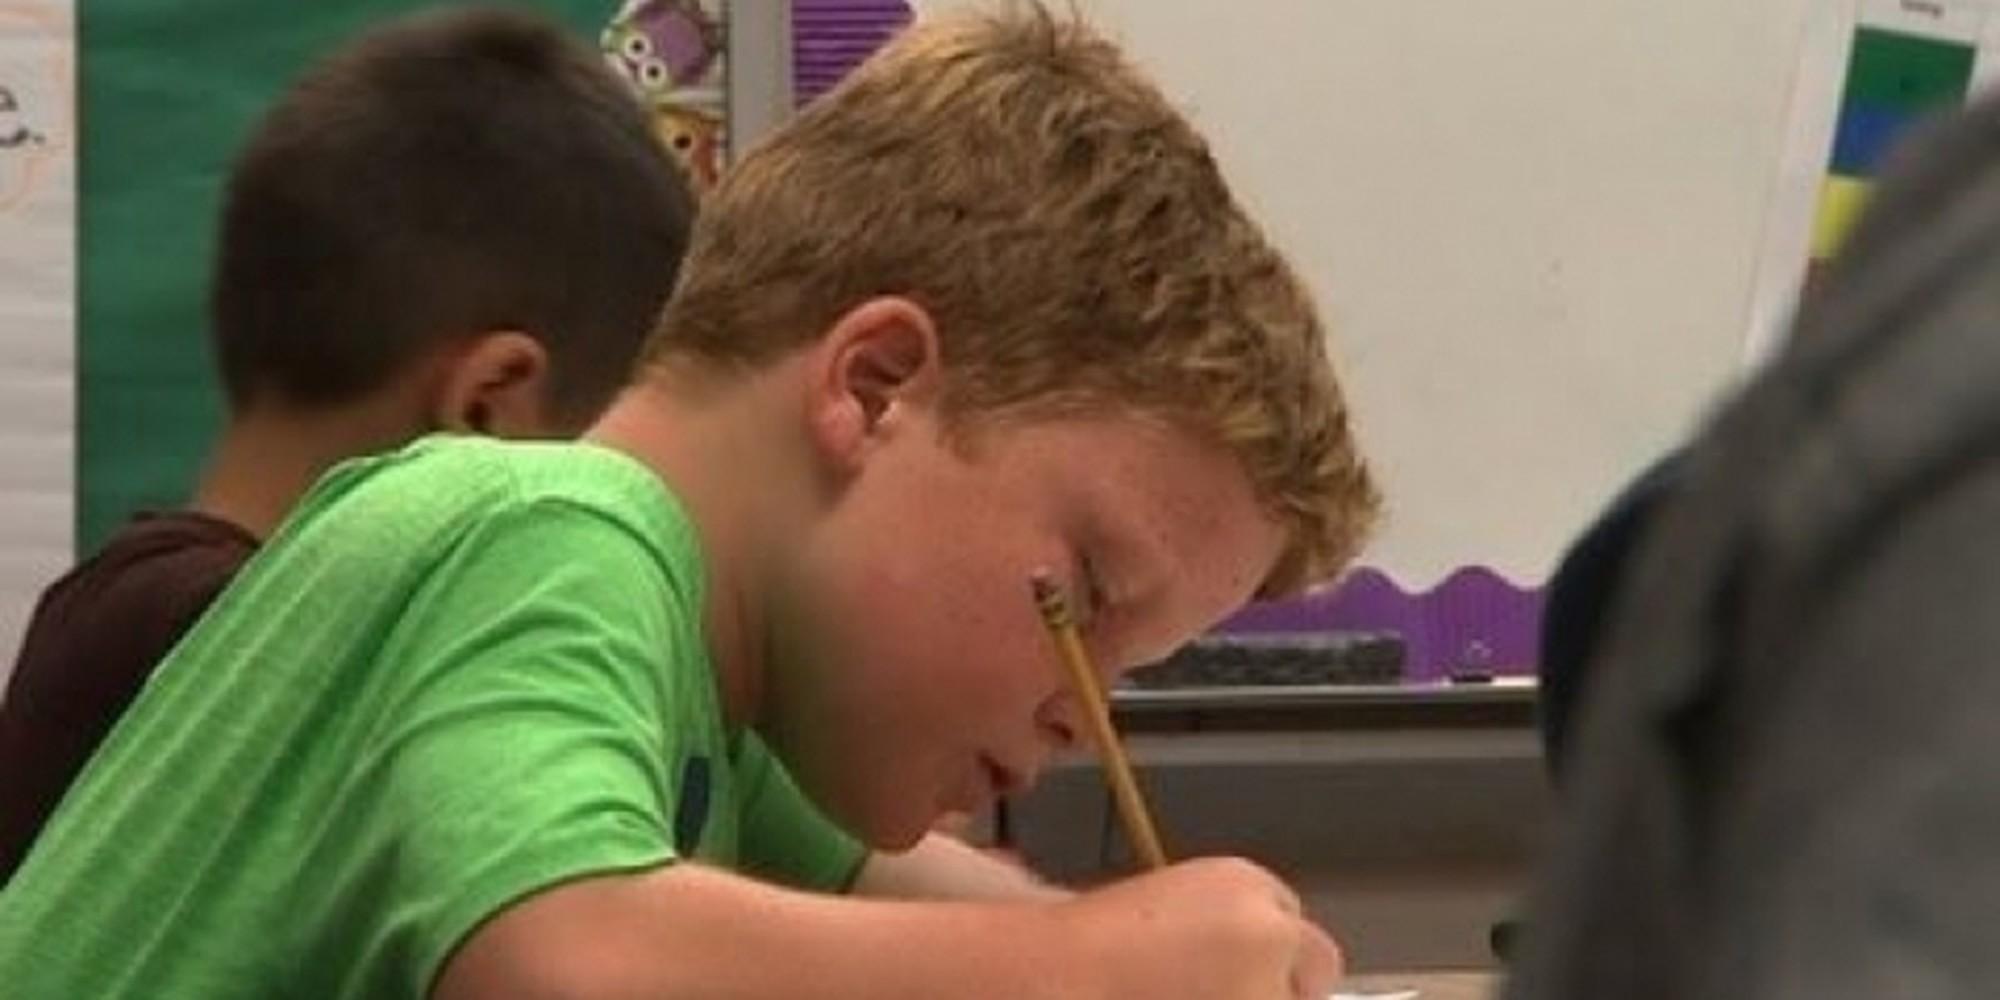 Mandatory homework